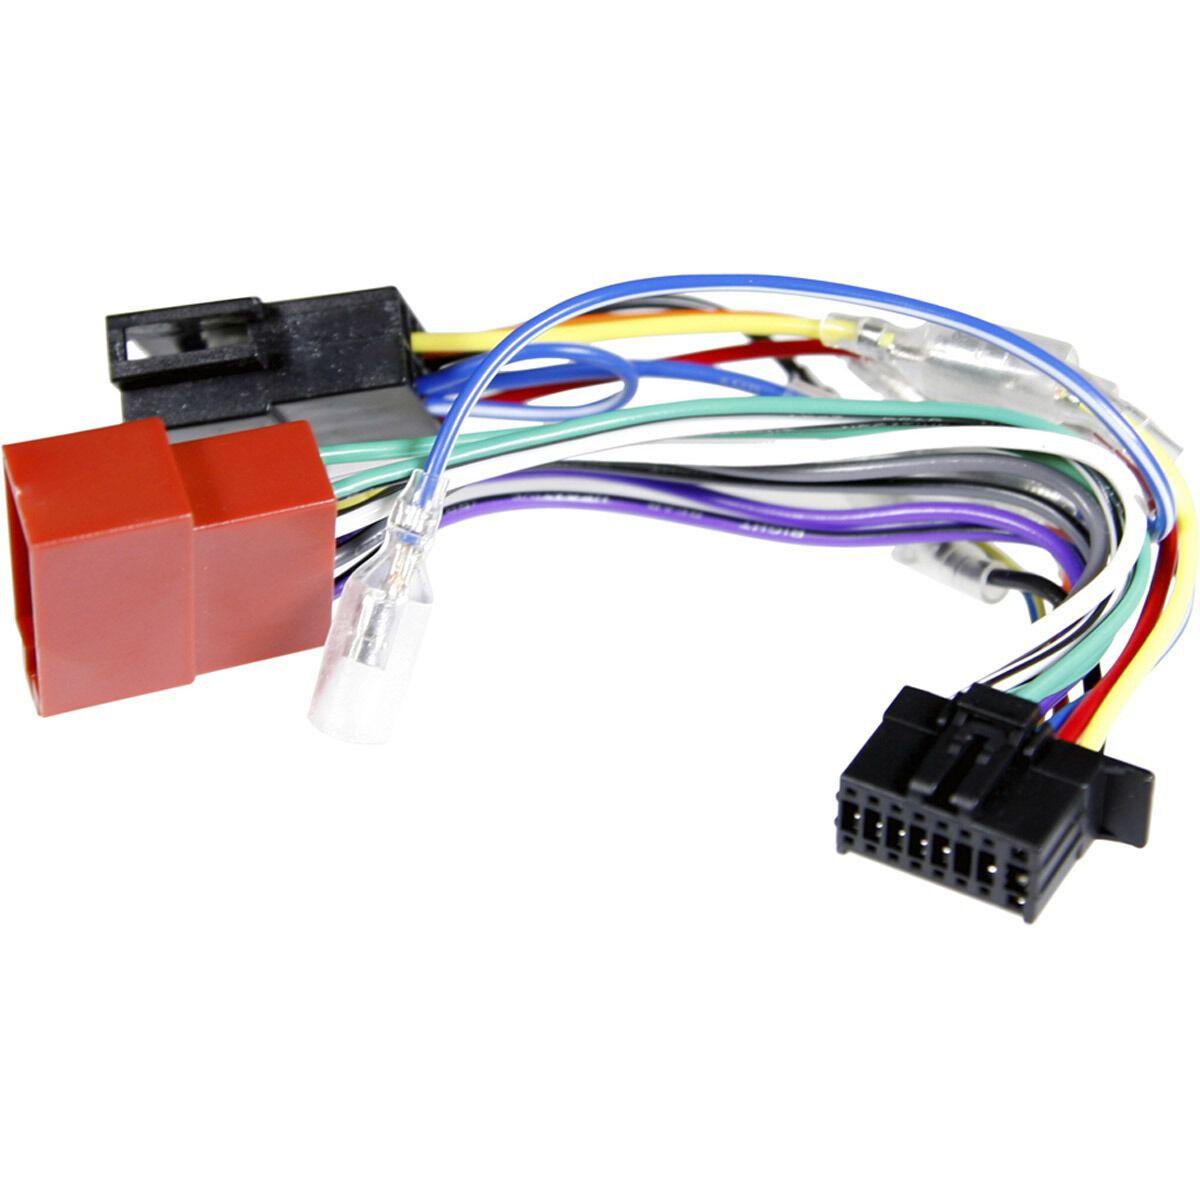 aerpro wiring harness suit jvc head units app8jvc5 supercheap rh  supercheapauto co nz jvc wiring harness colors jvc wiring harness walmart